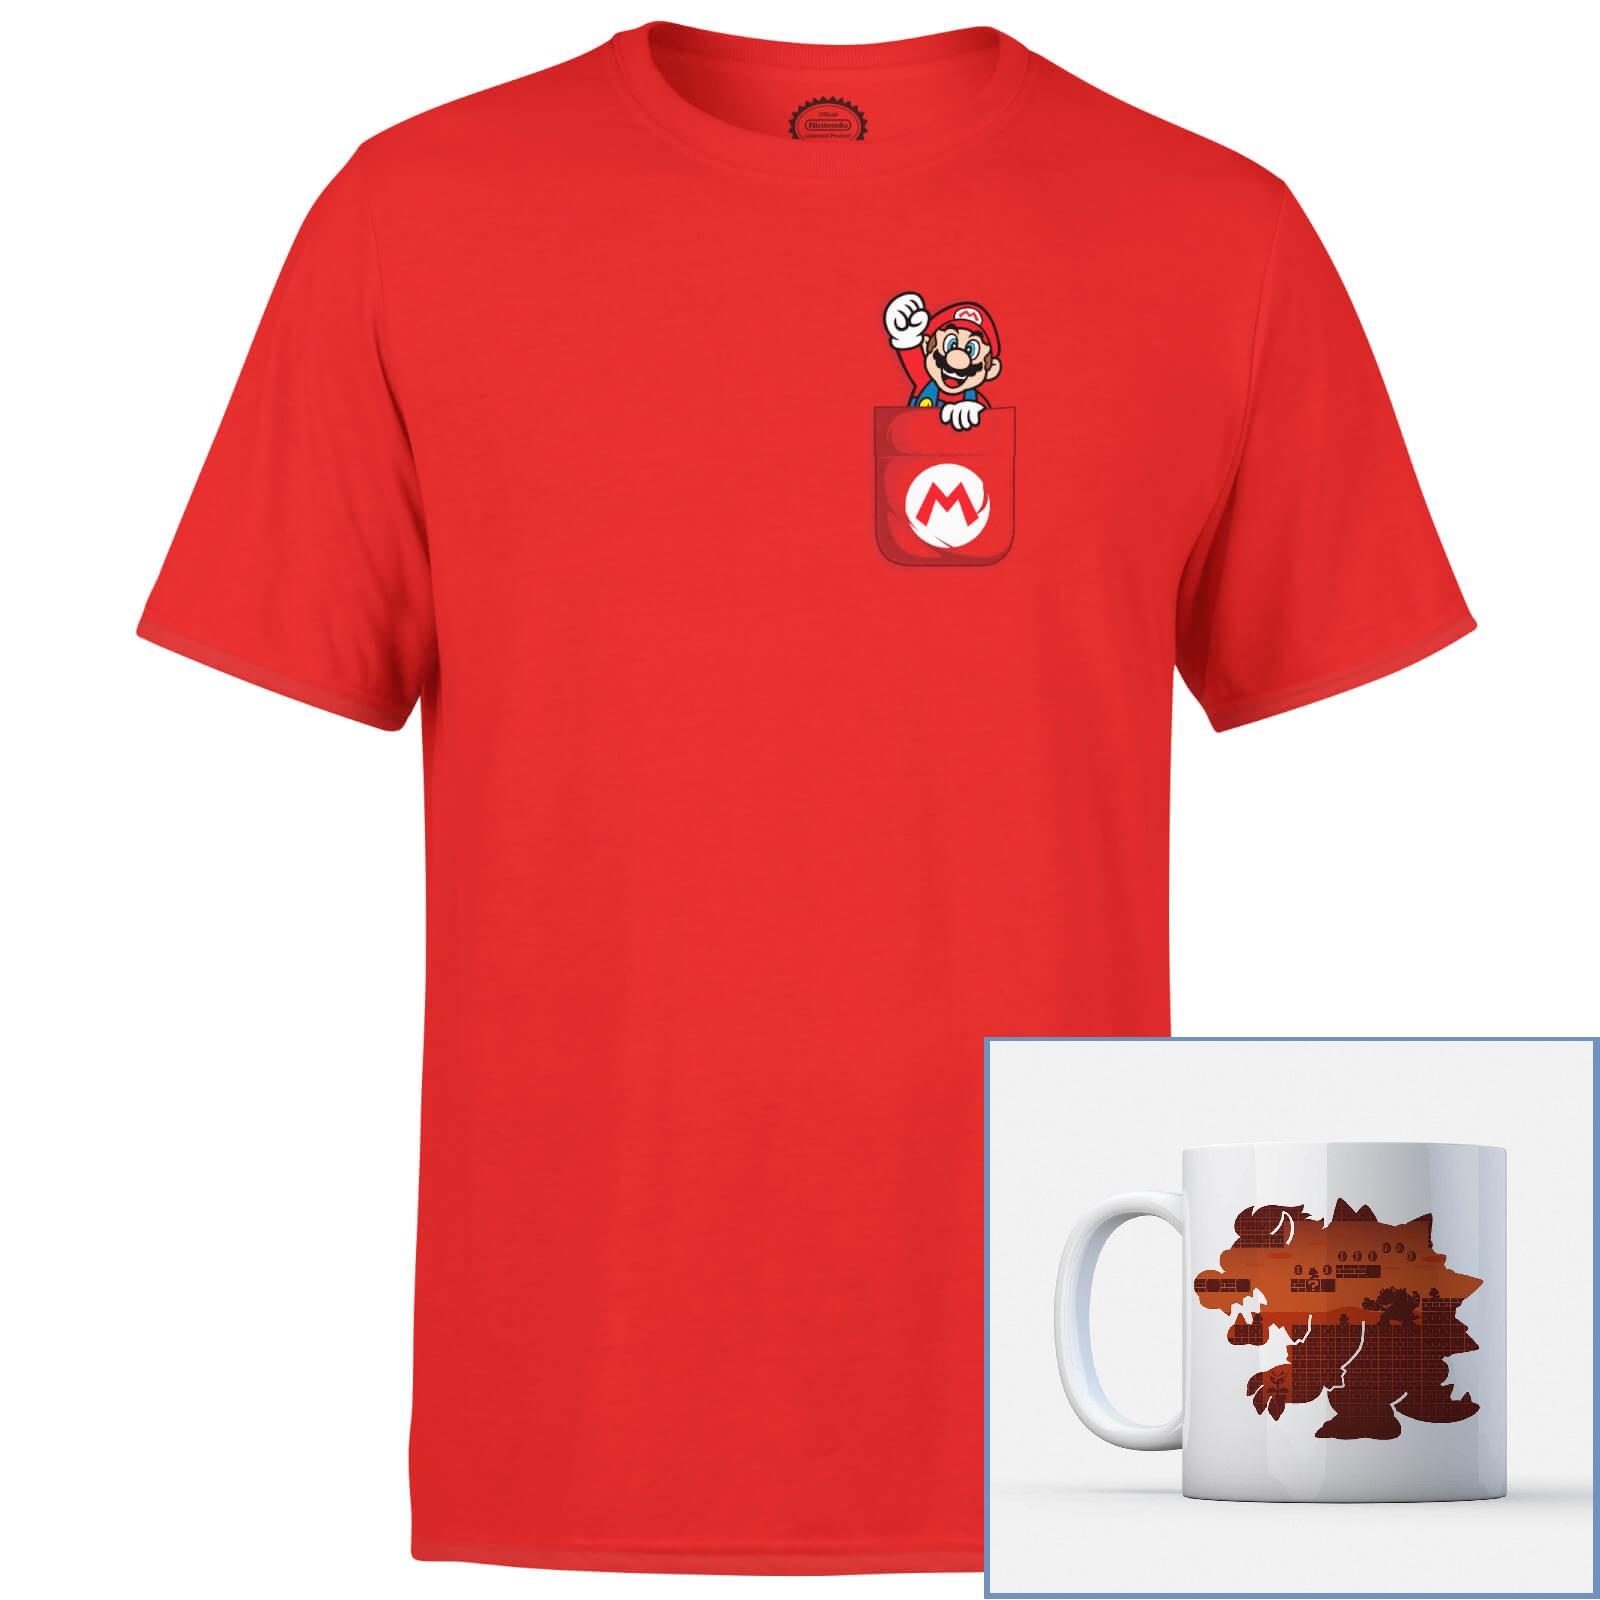 Pack Nintendo T-Shirt (Hommes & Femmes, du S au XXL) + Mug officiel - Ex : T-Shirt Mario + Mug Bowser + livraison offerte